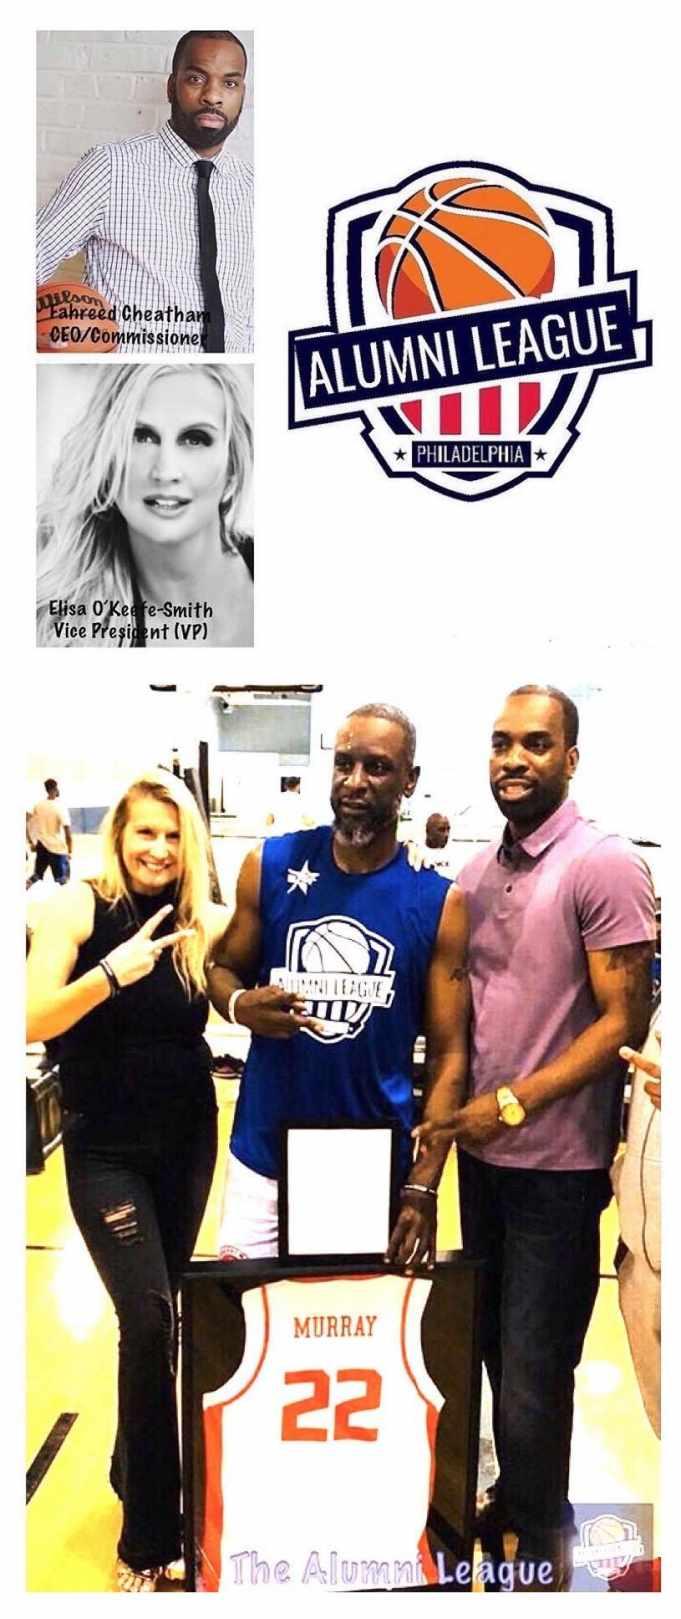 Cheatham & O'Keefe-Smith w/ Alumni League Star Player & ex-NBA vet Flip Murray